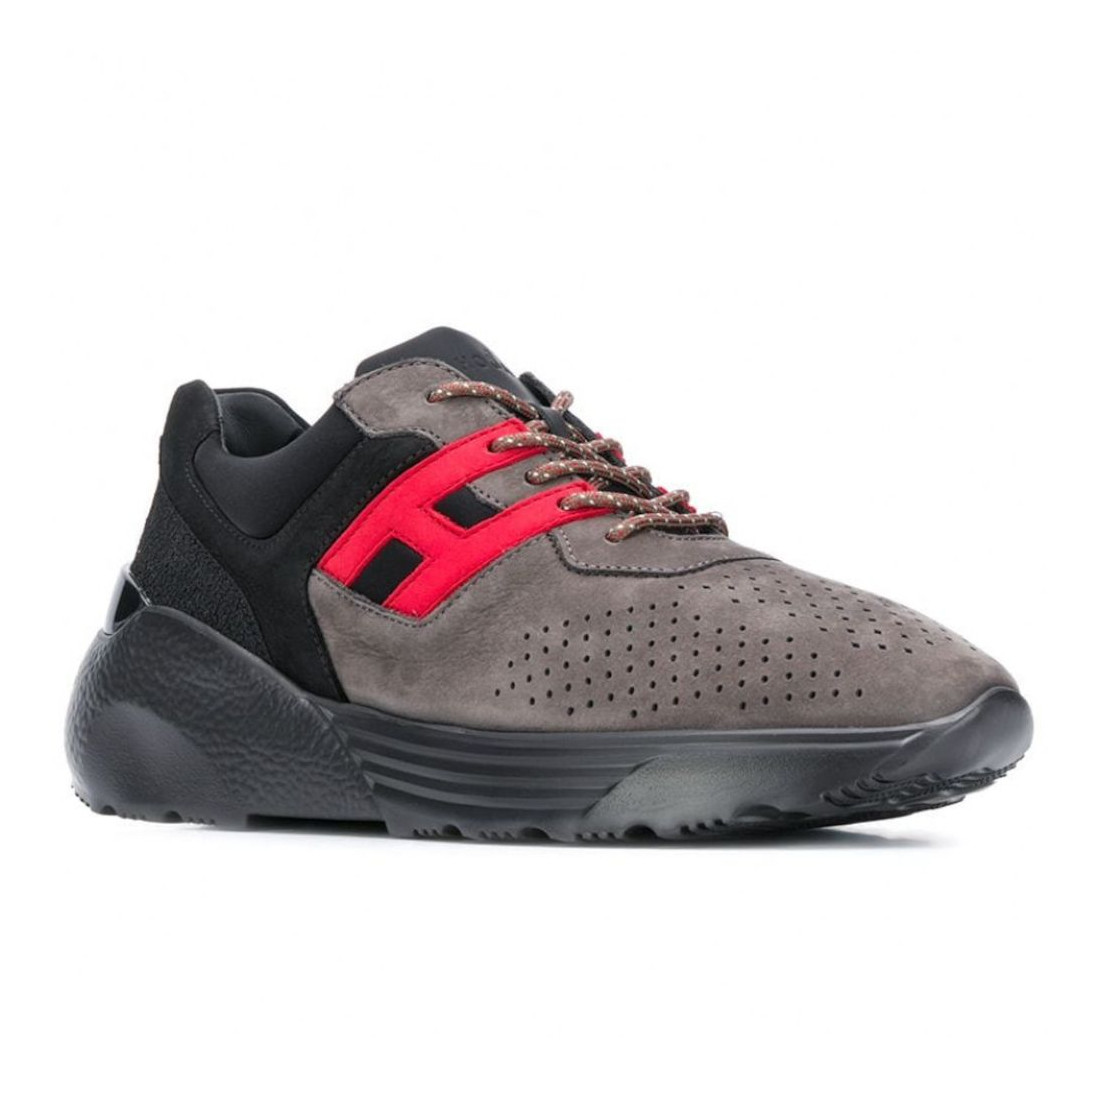 sneakers herren hogan hxm4430br10o8e785p 7544